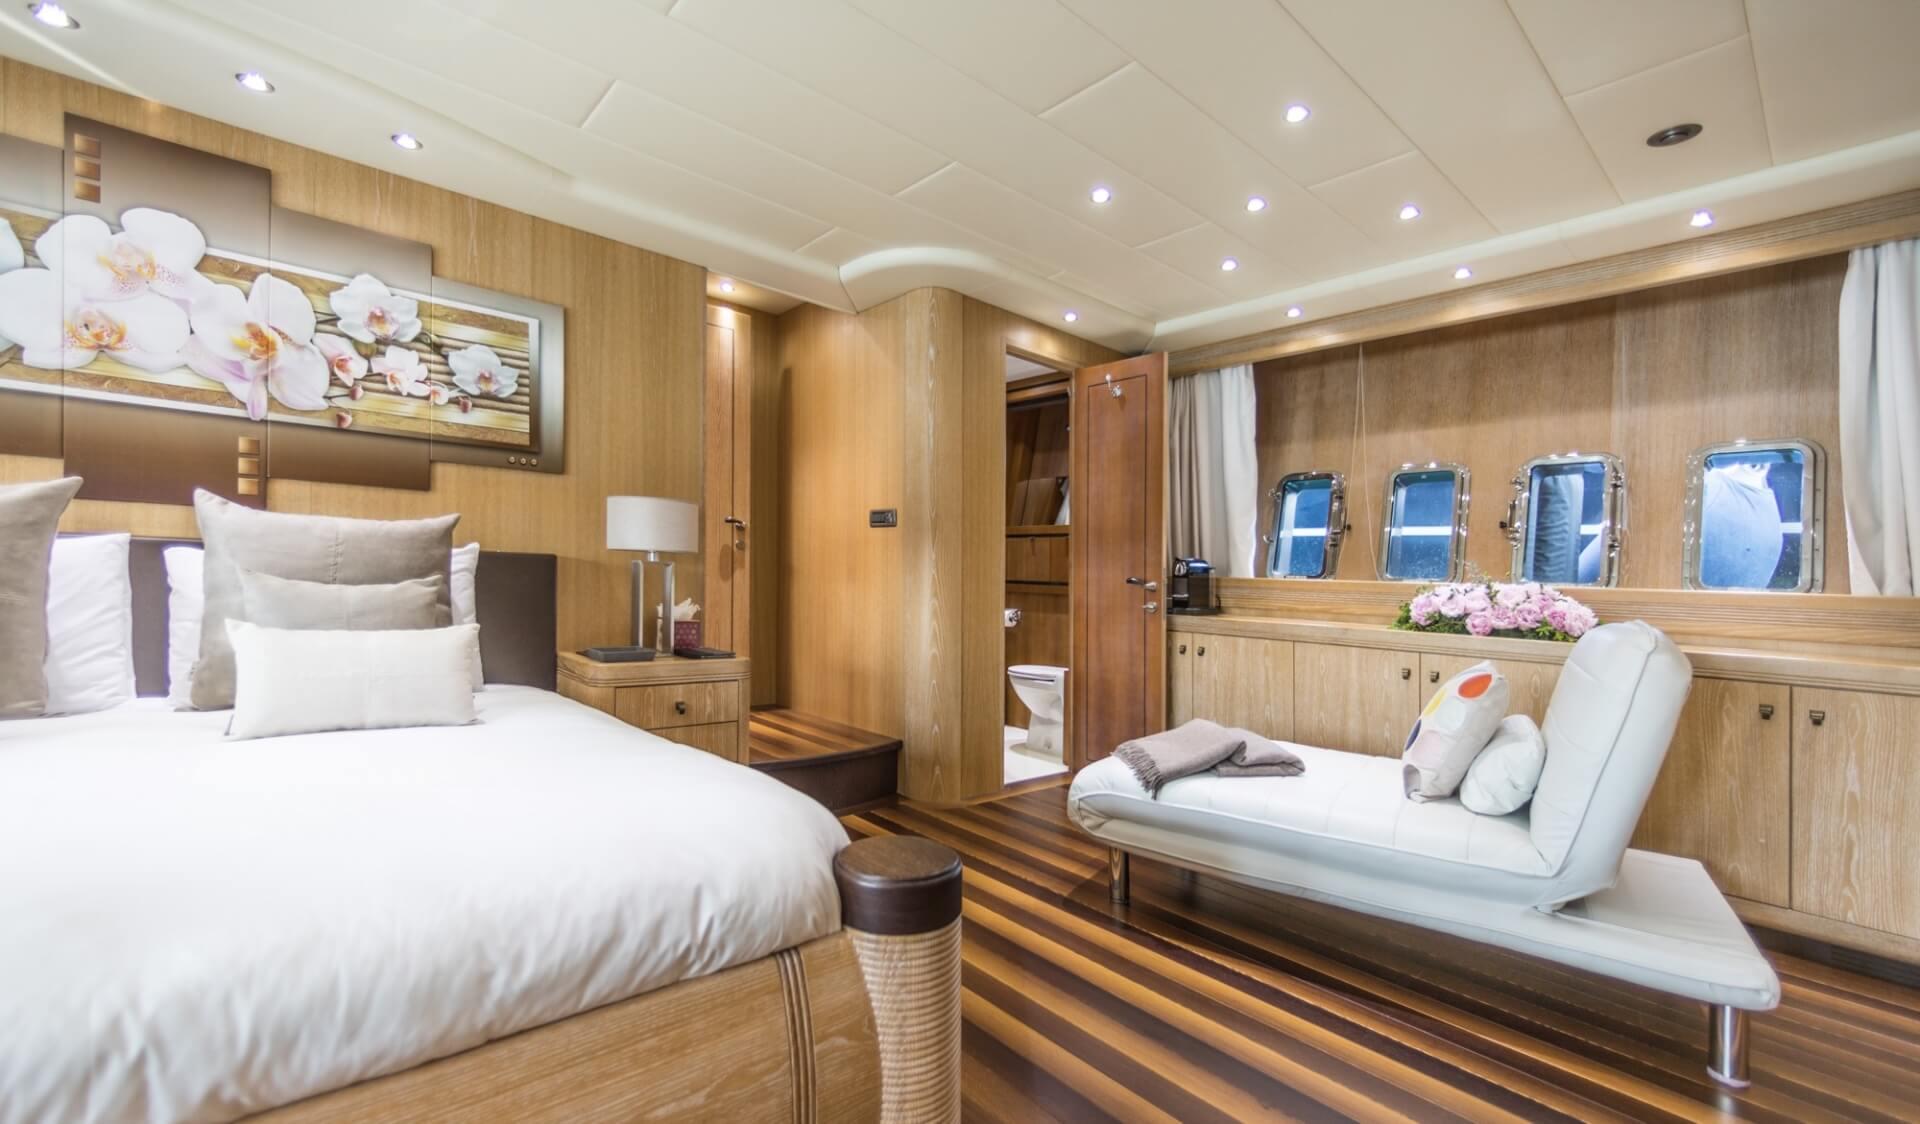 Mangusta 108 Jff Yacht Charter In Saint Tropez Monaco And Cannes